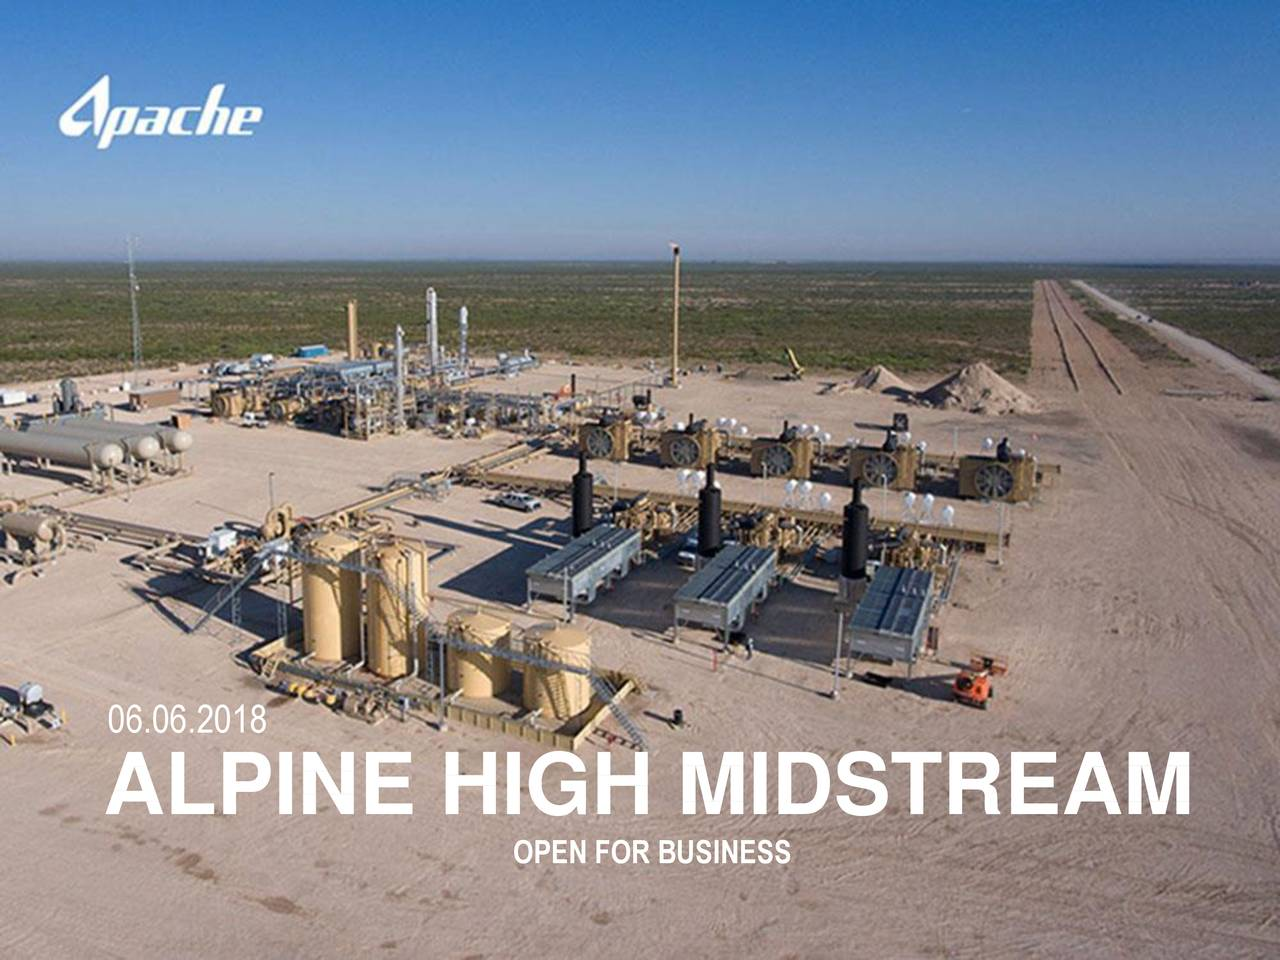 ALPINE HIGH MIDSTREAM OPEN FOR BUSINESS